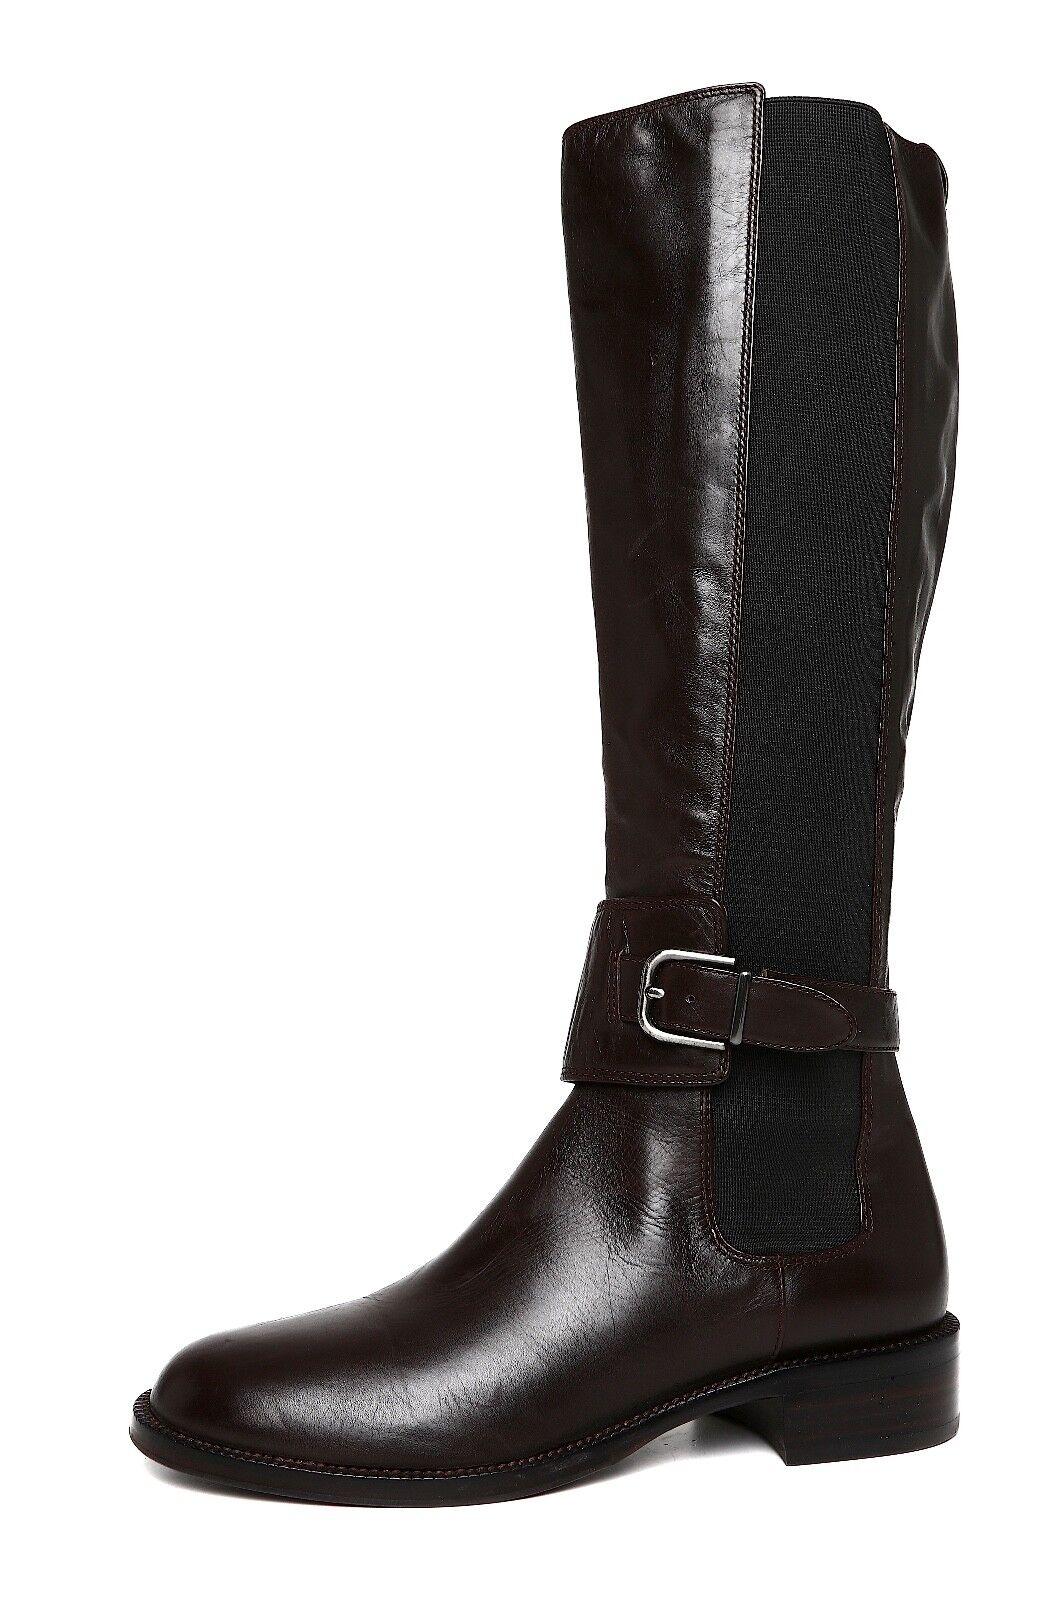 Via Spiga Bufu Tall Leather Boot Dark Brown Women Sz 7 M 2050 *